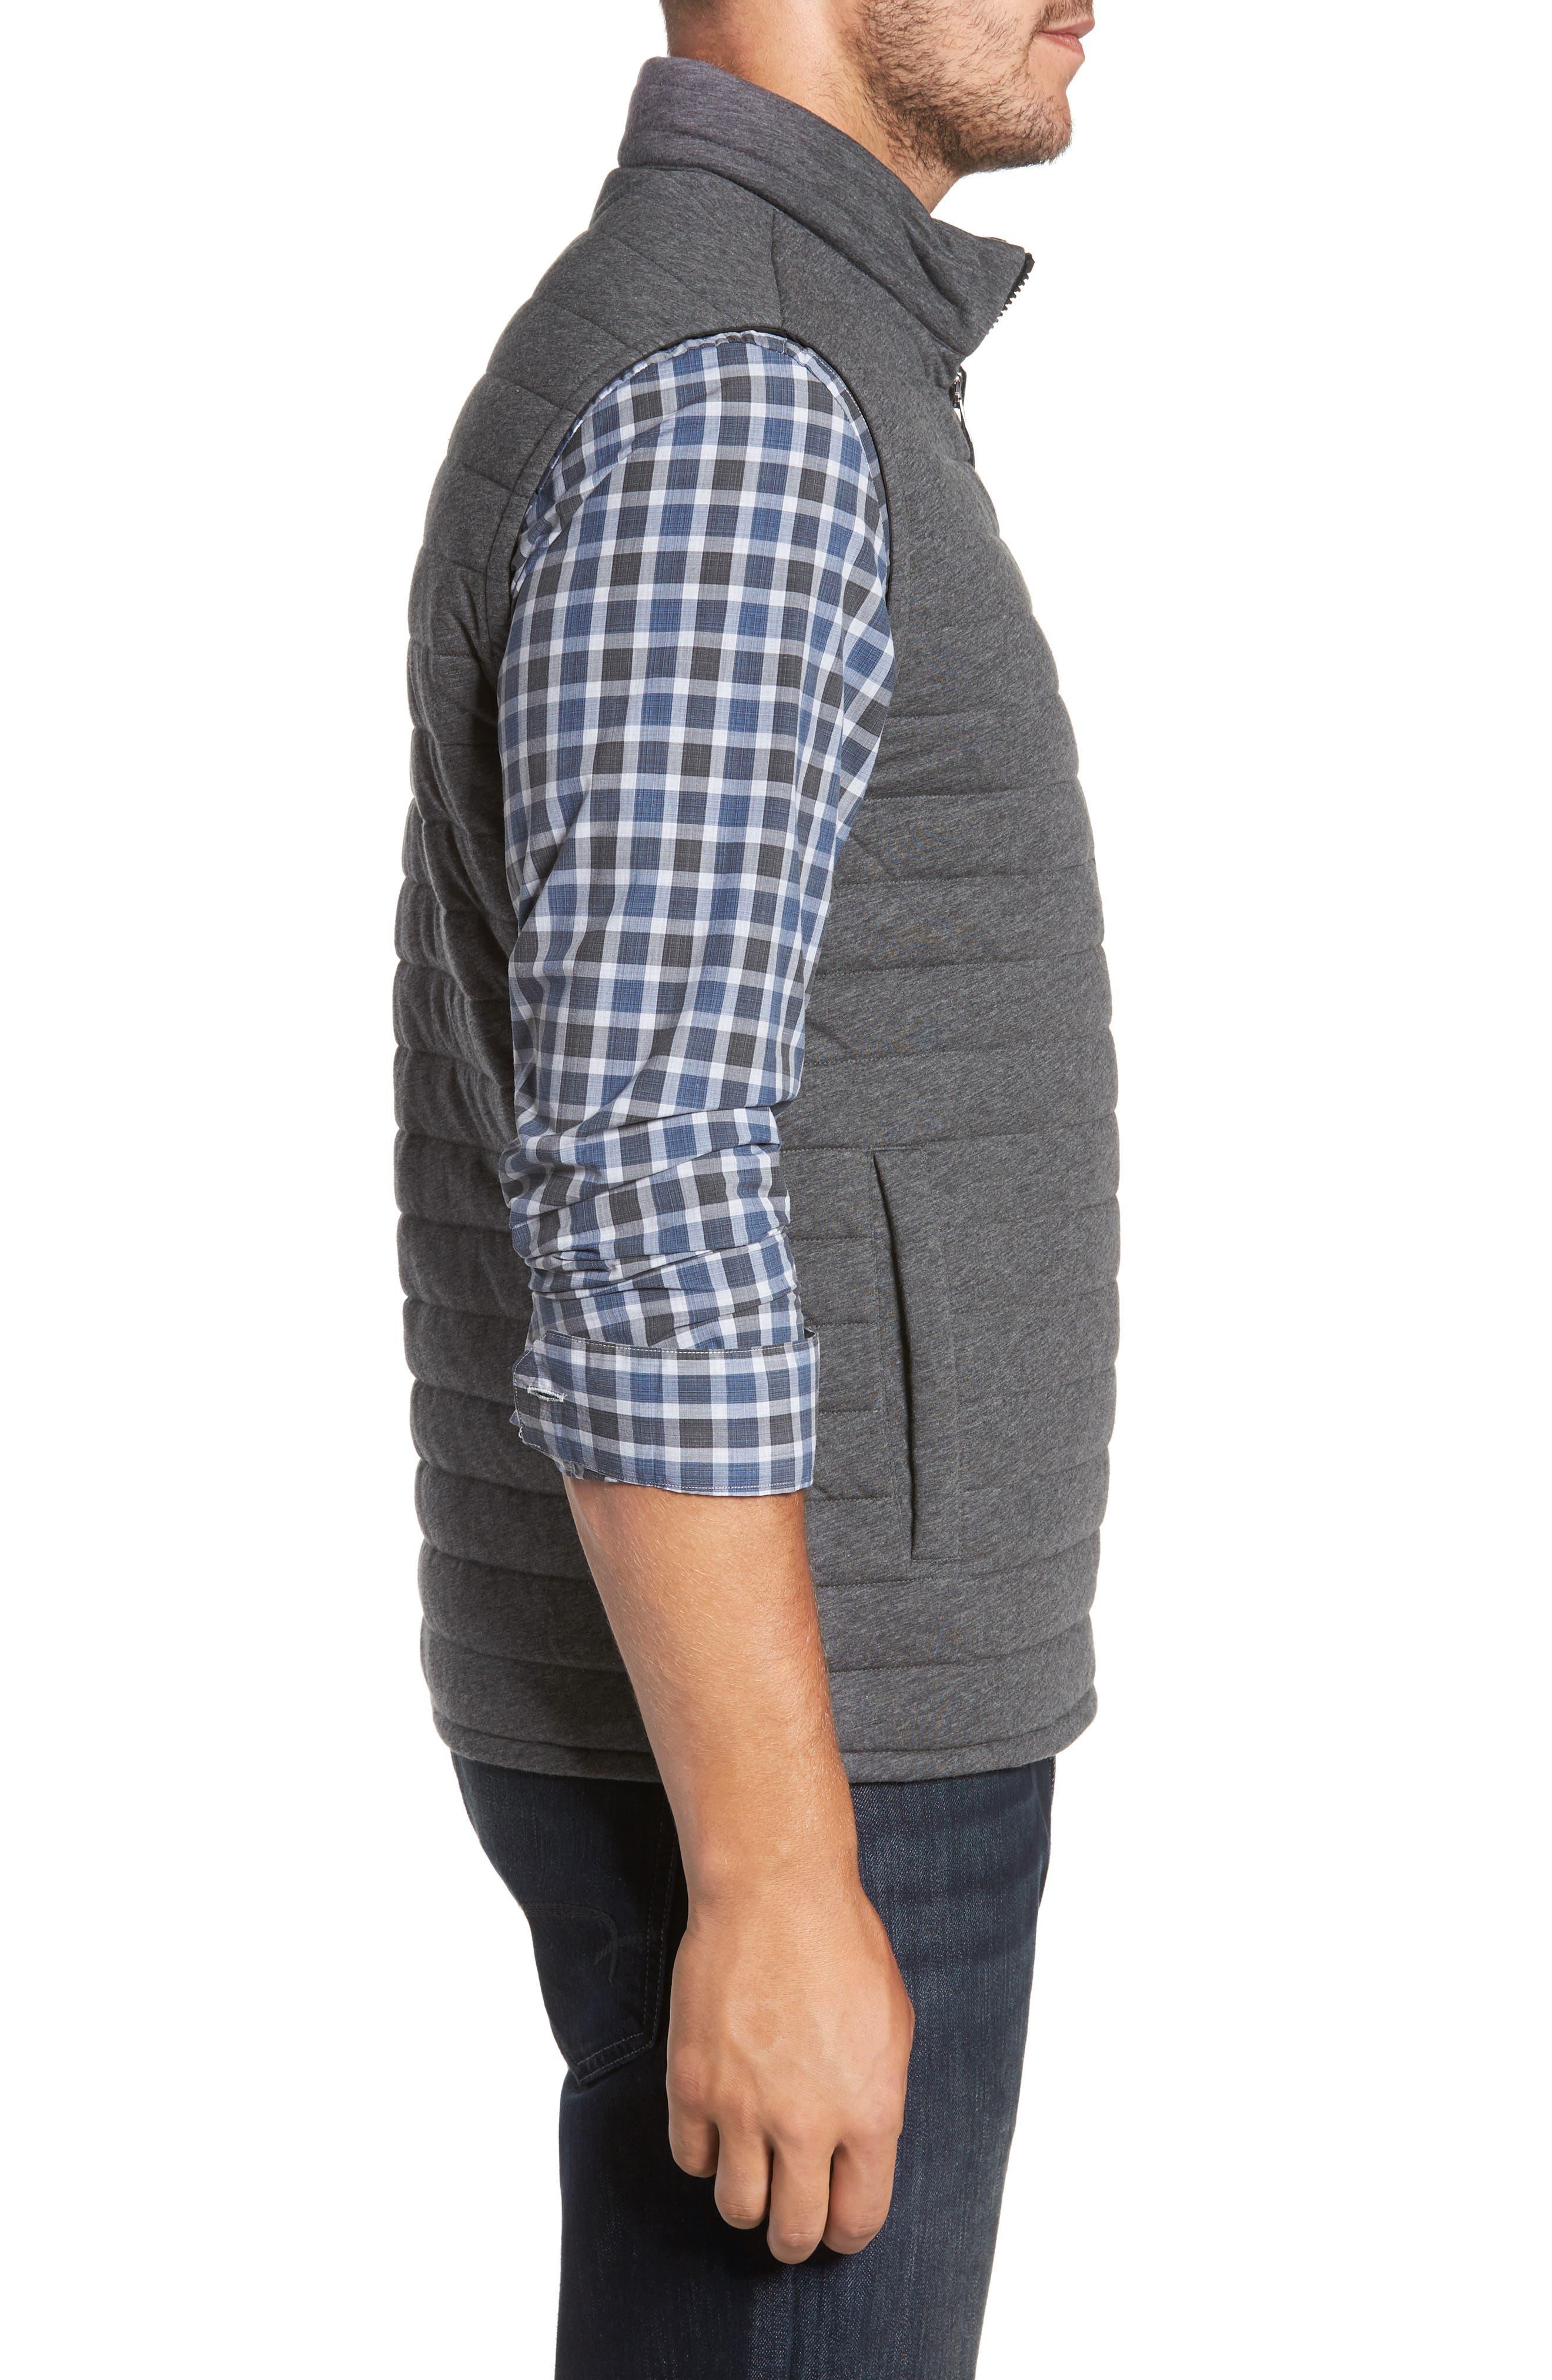 Gallagher Reversible Vest,                             Alternate thumbnail 3, color,                             CHARCOAL